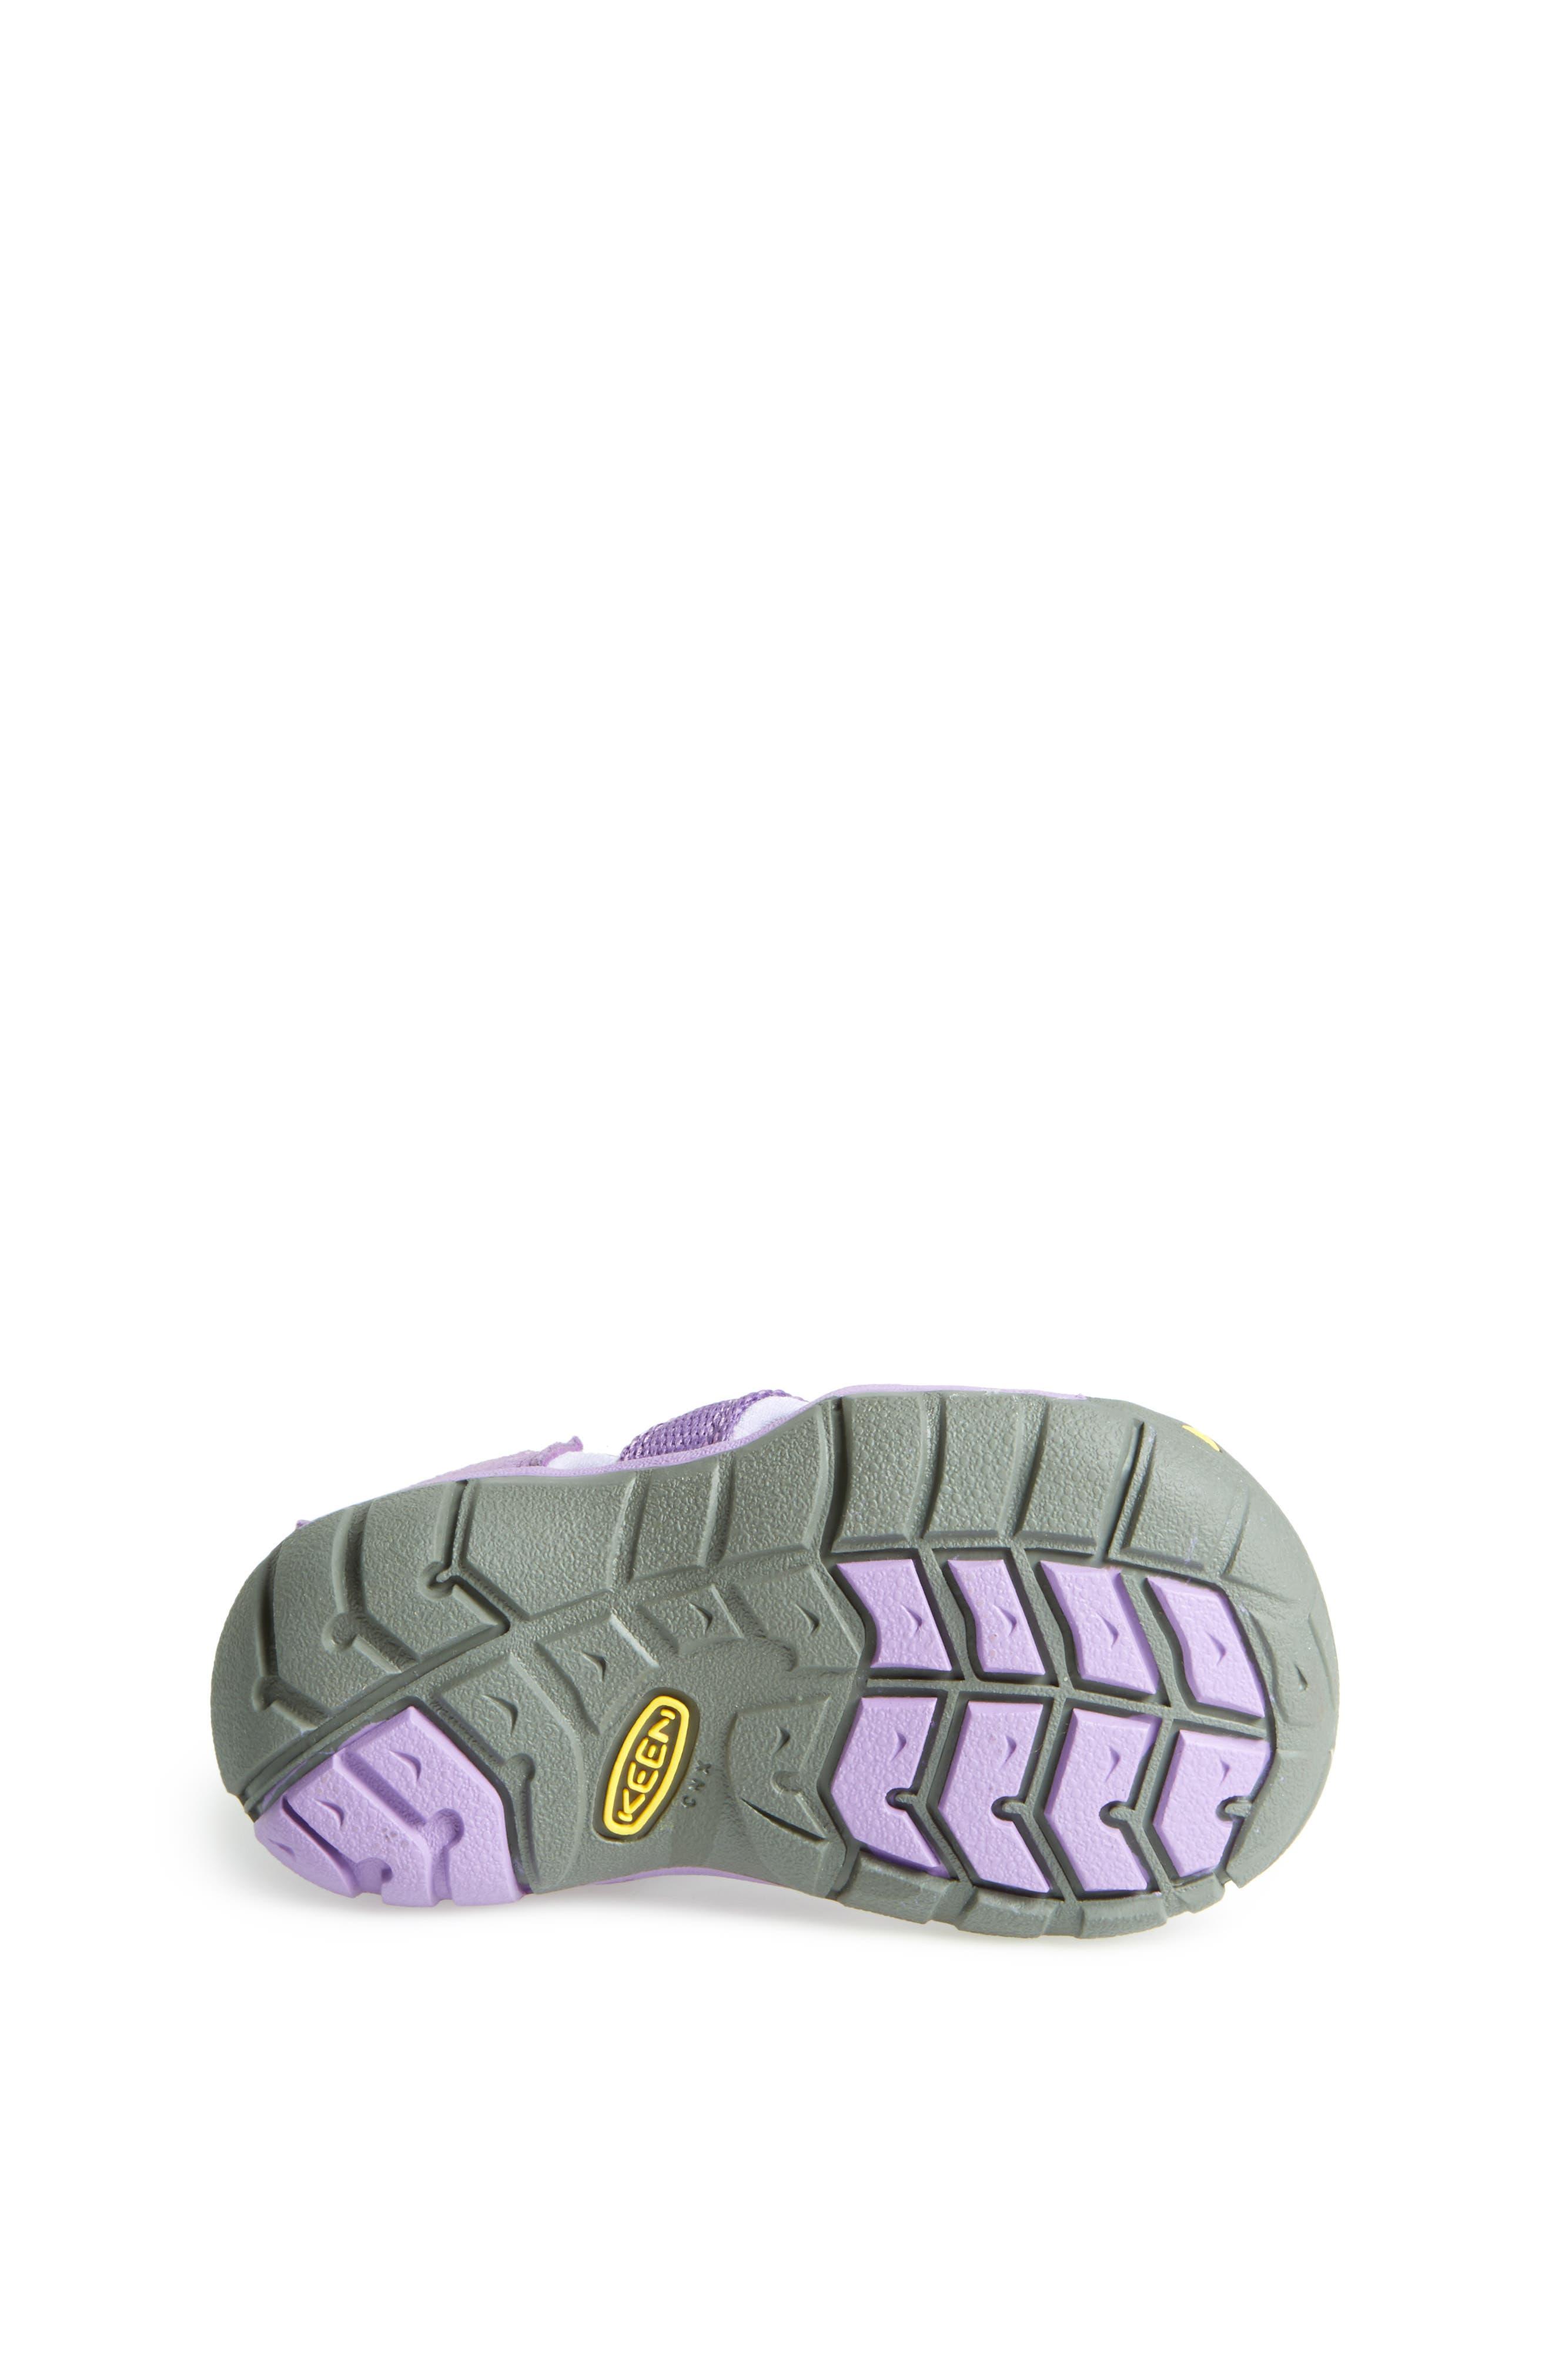 ,                             'Seacamp II' Water Friendly Sandal,                             Alternate thumbnail 231, color,                             555